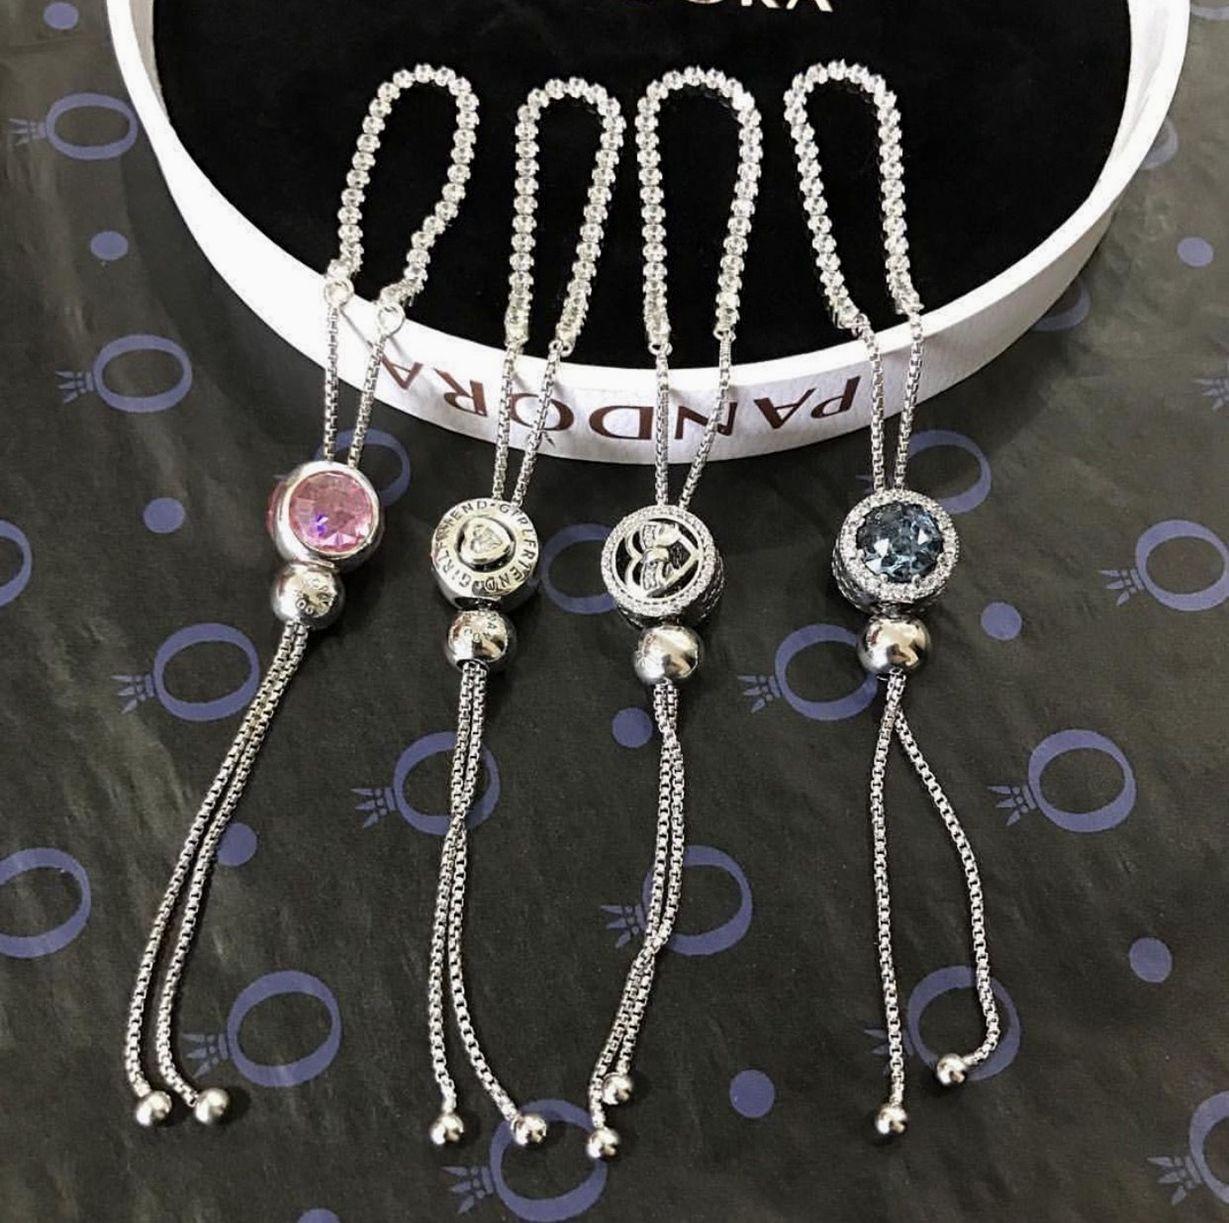 Who Sells Pandora Jewelry: Jewelry Stores That Sell Pandora